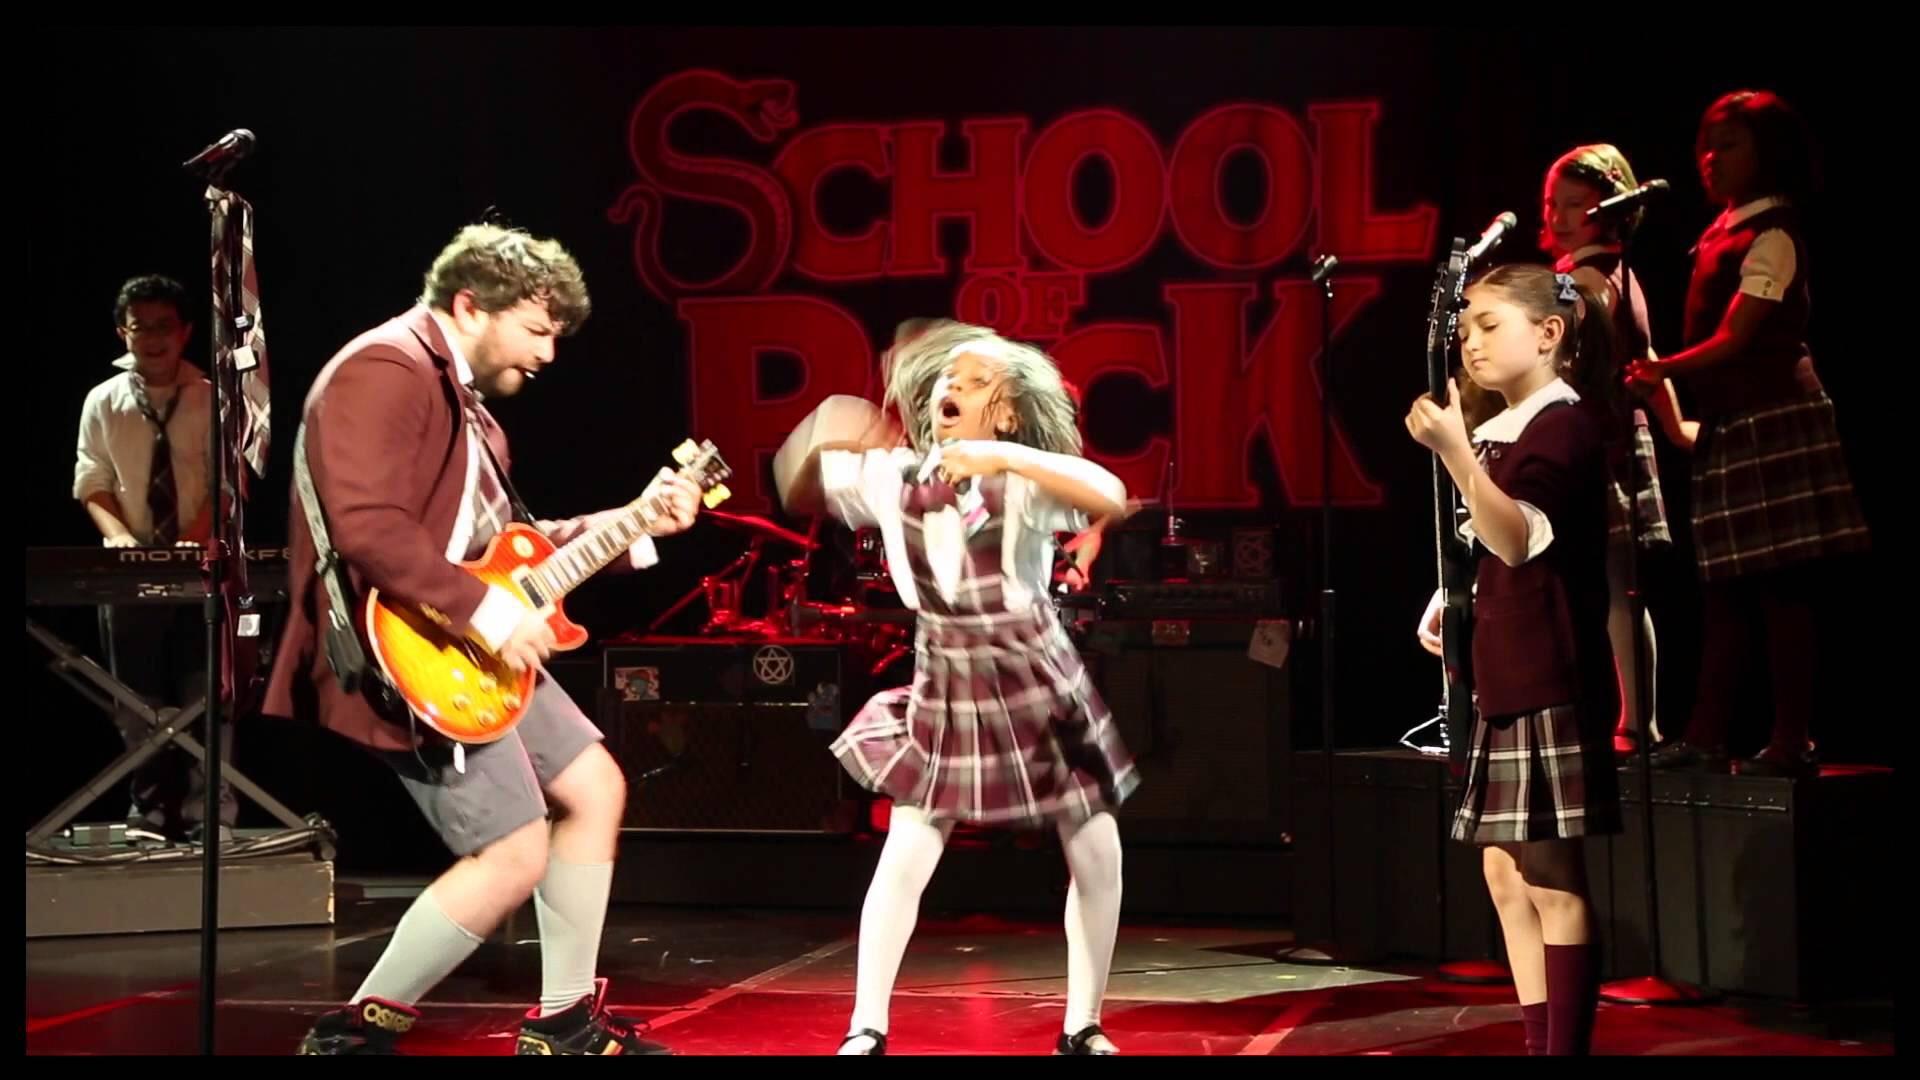 Surprisingly Excellent School Of Rock At The Winter Garden Theatre